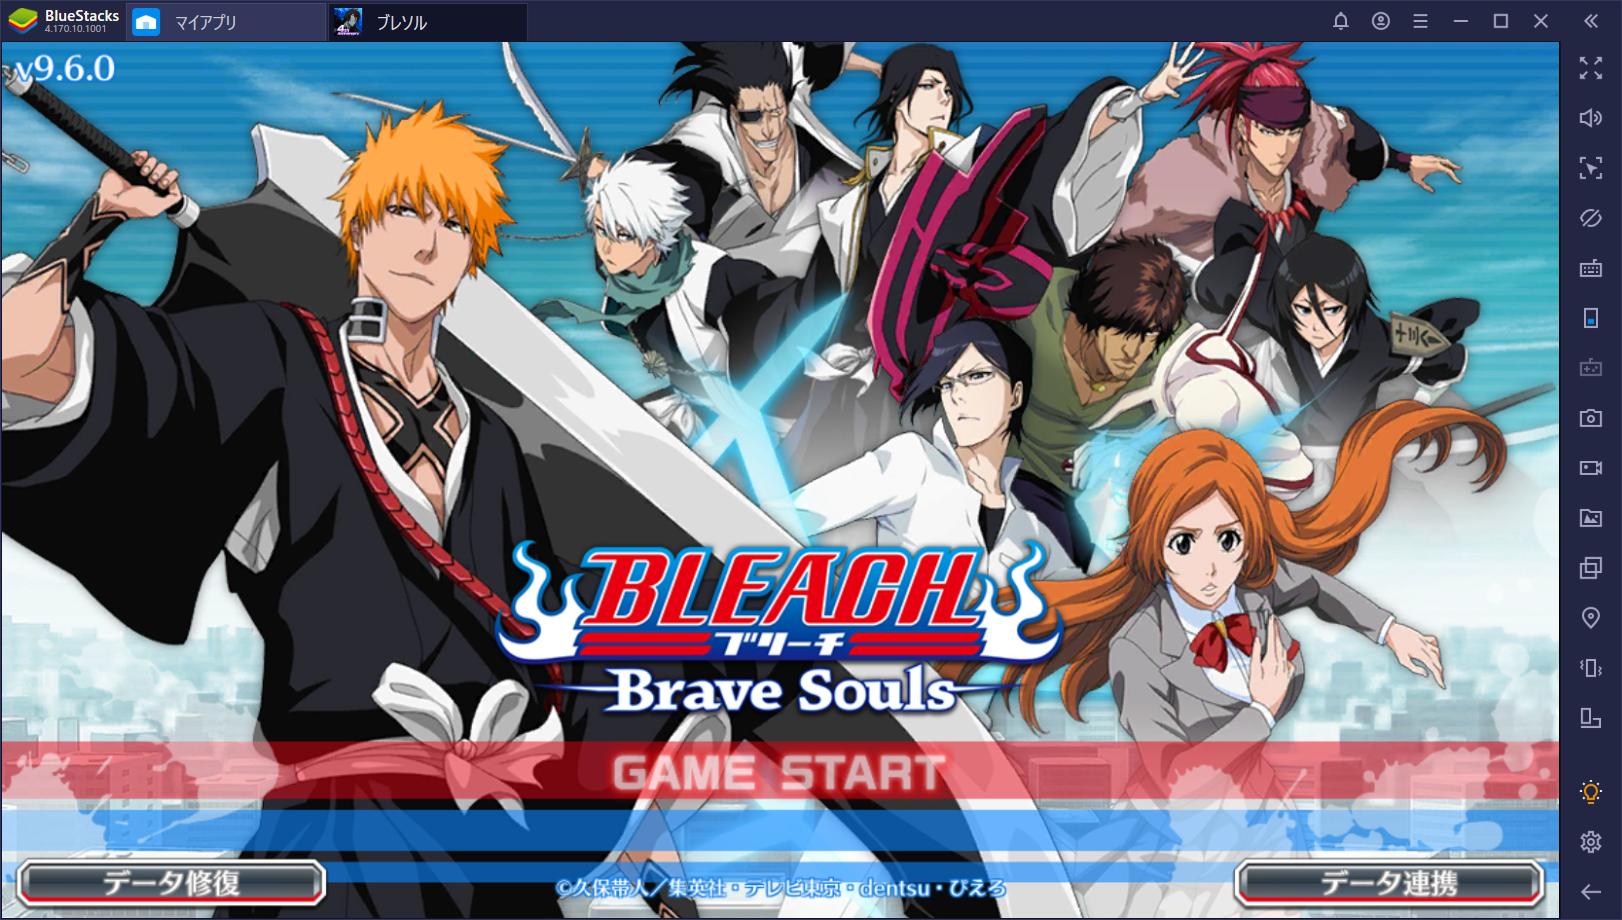 BlueStacksを使ってPCで『BLEACH Brave Souls』を遊ぼう